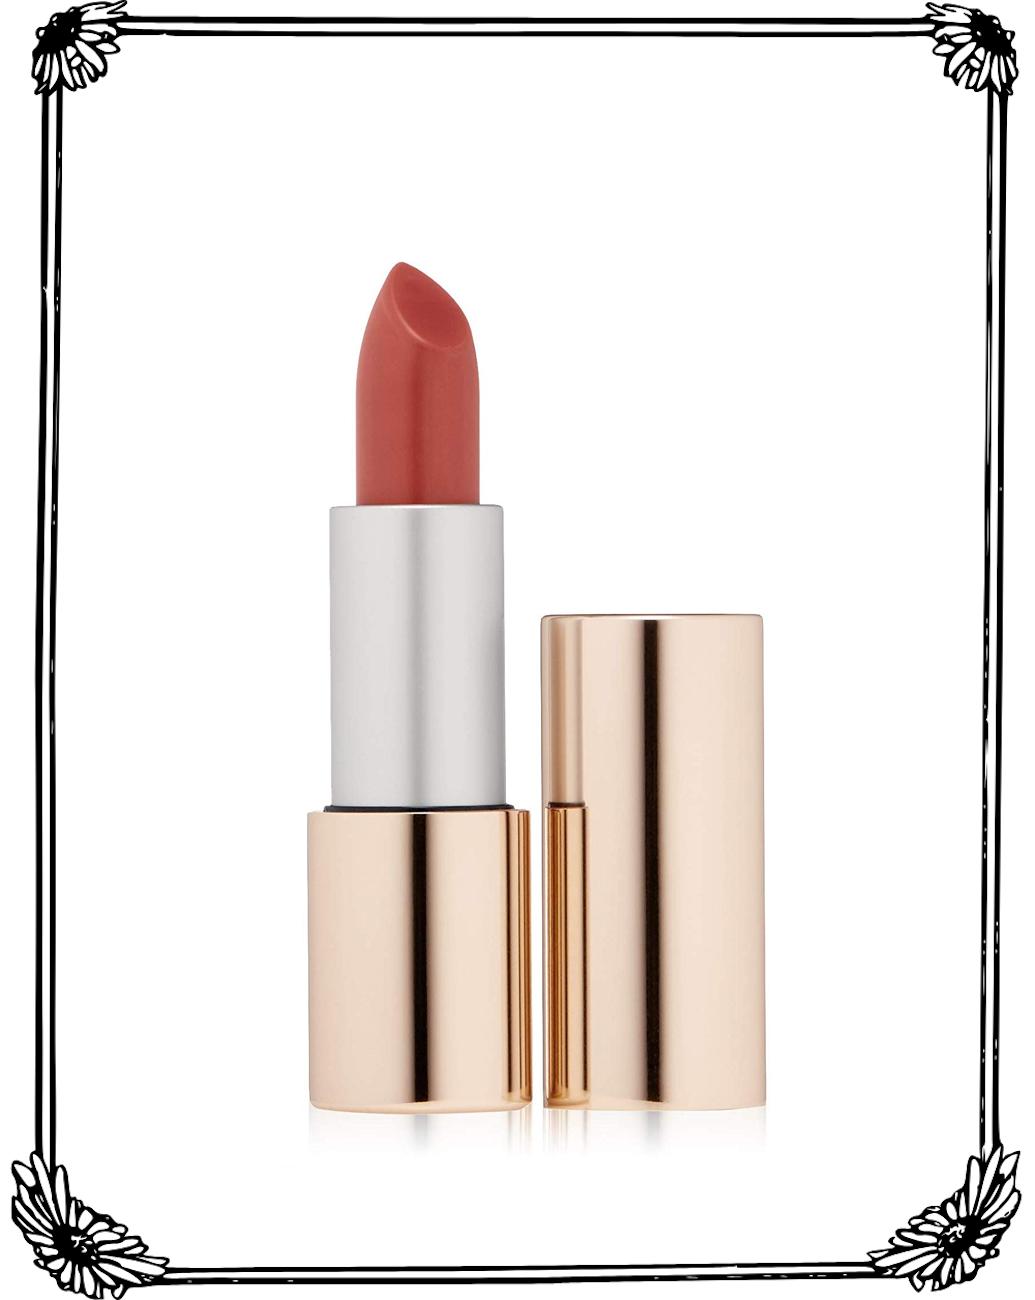 jane-iredale-lipstick.png